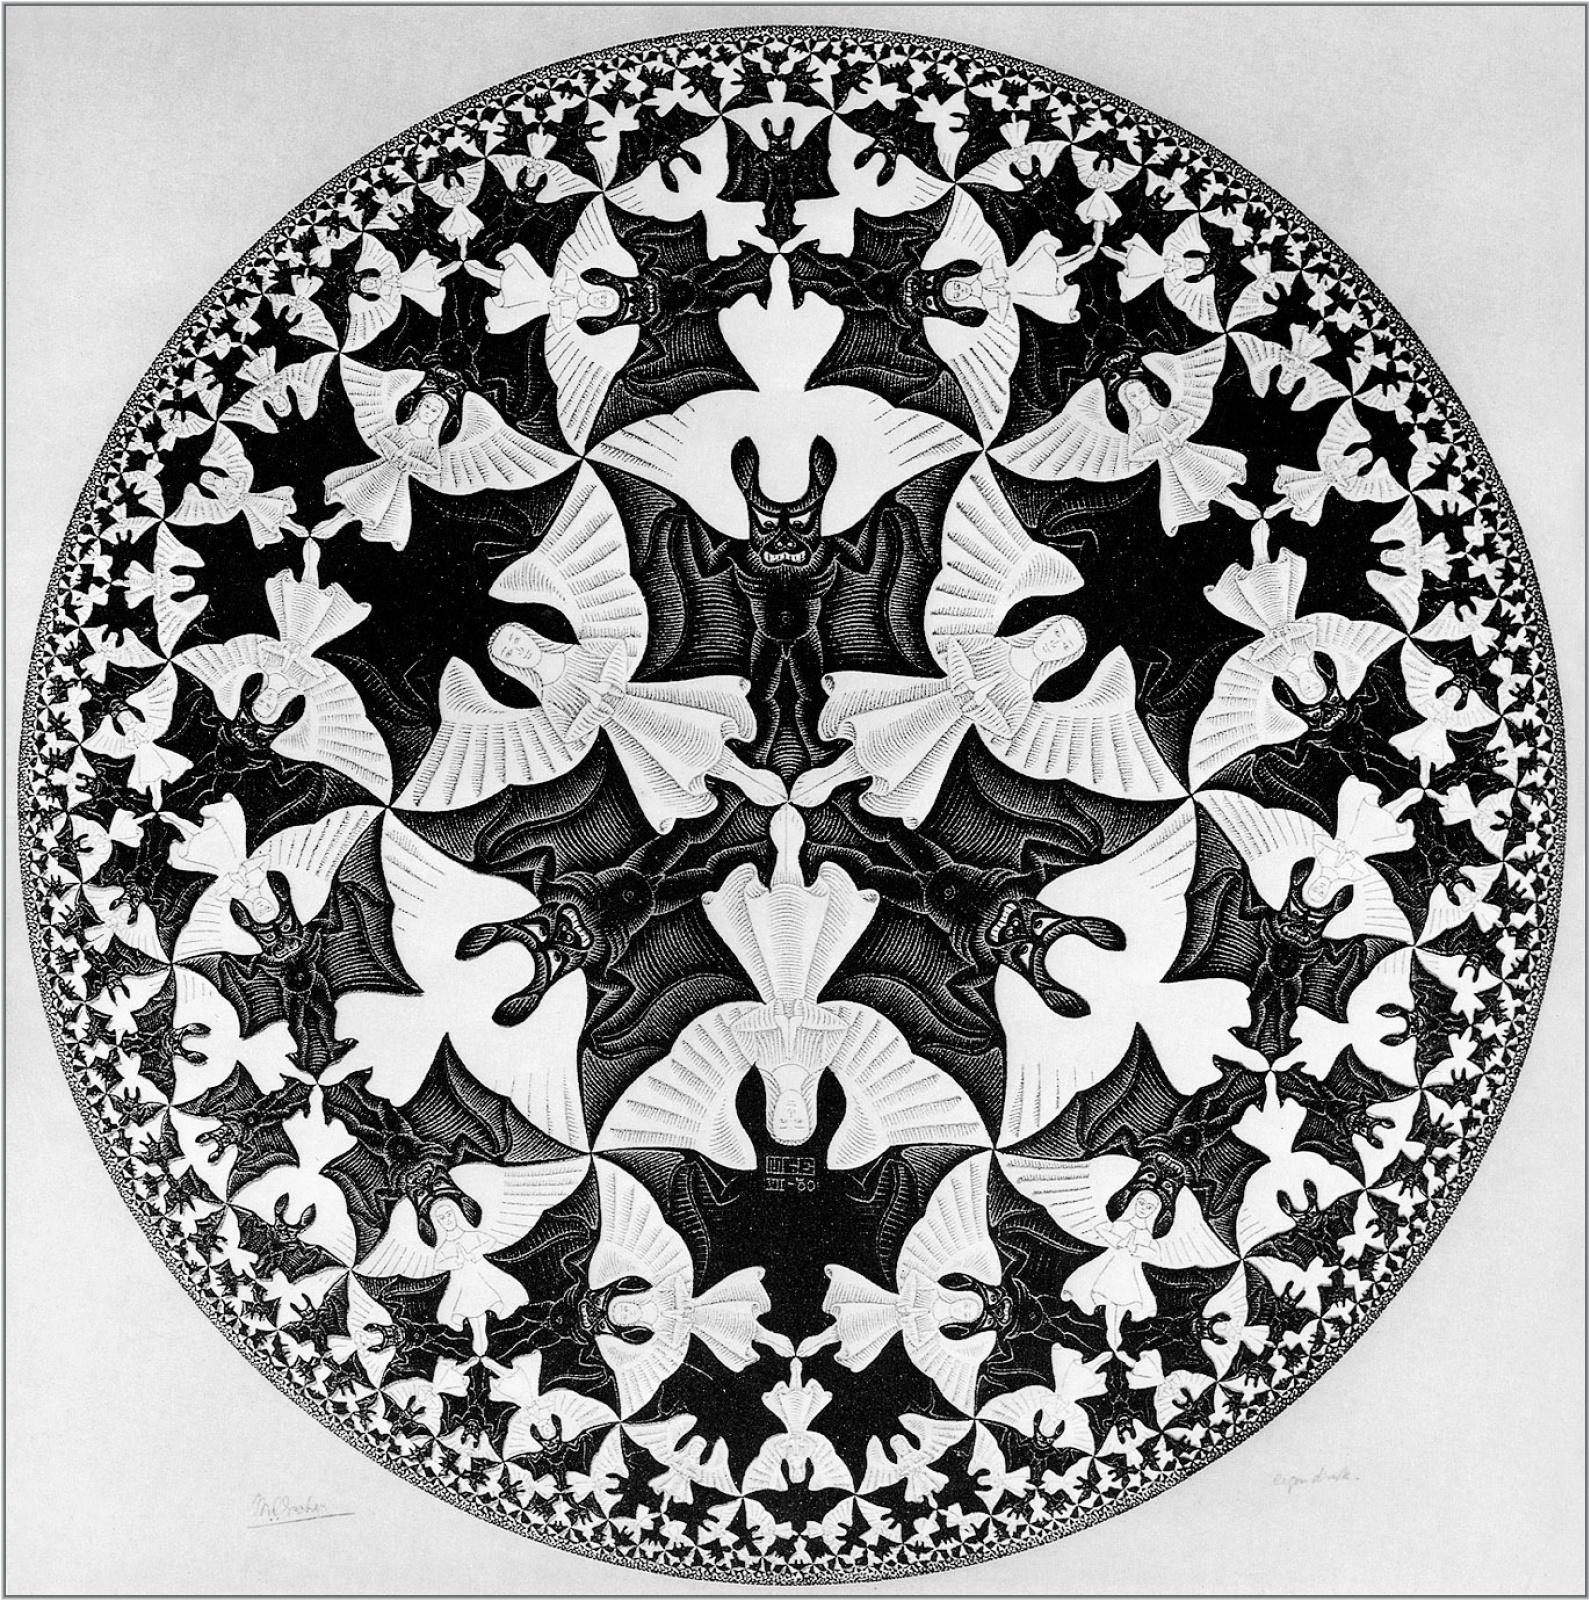 Мауриц Корнелис Эшер. Ограниченный круг1